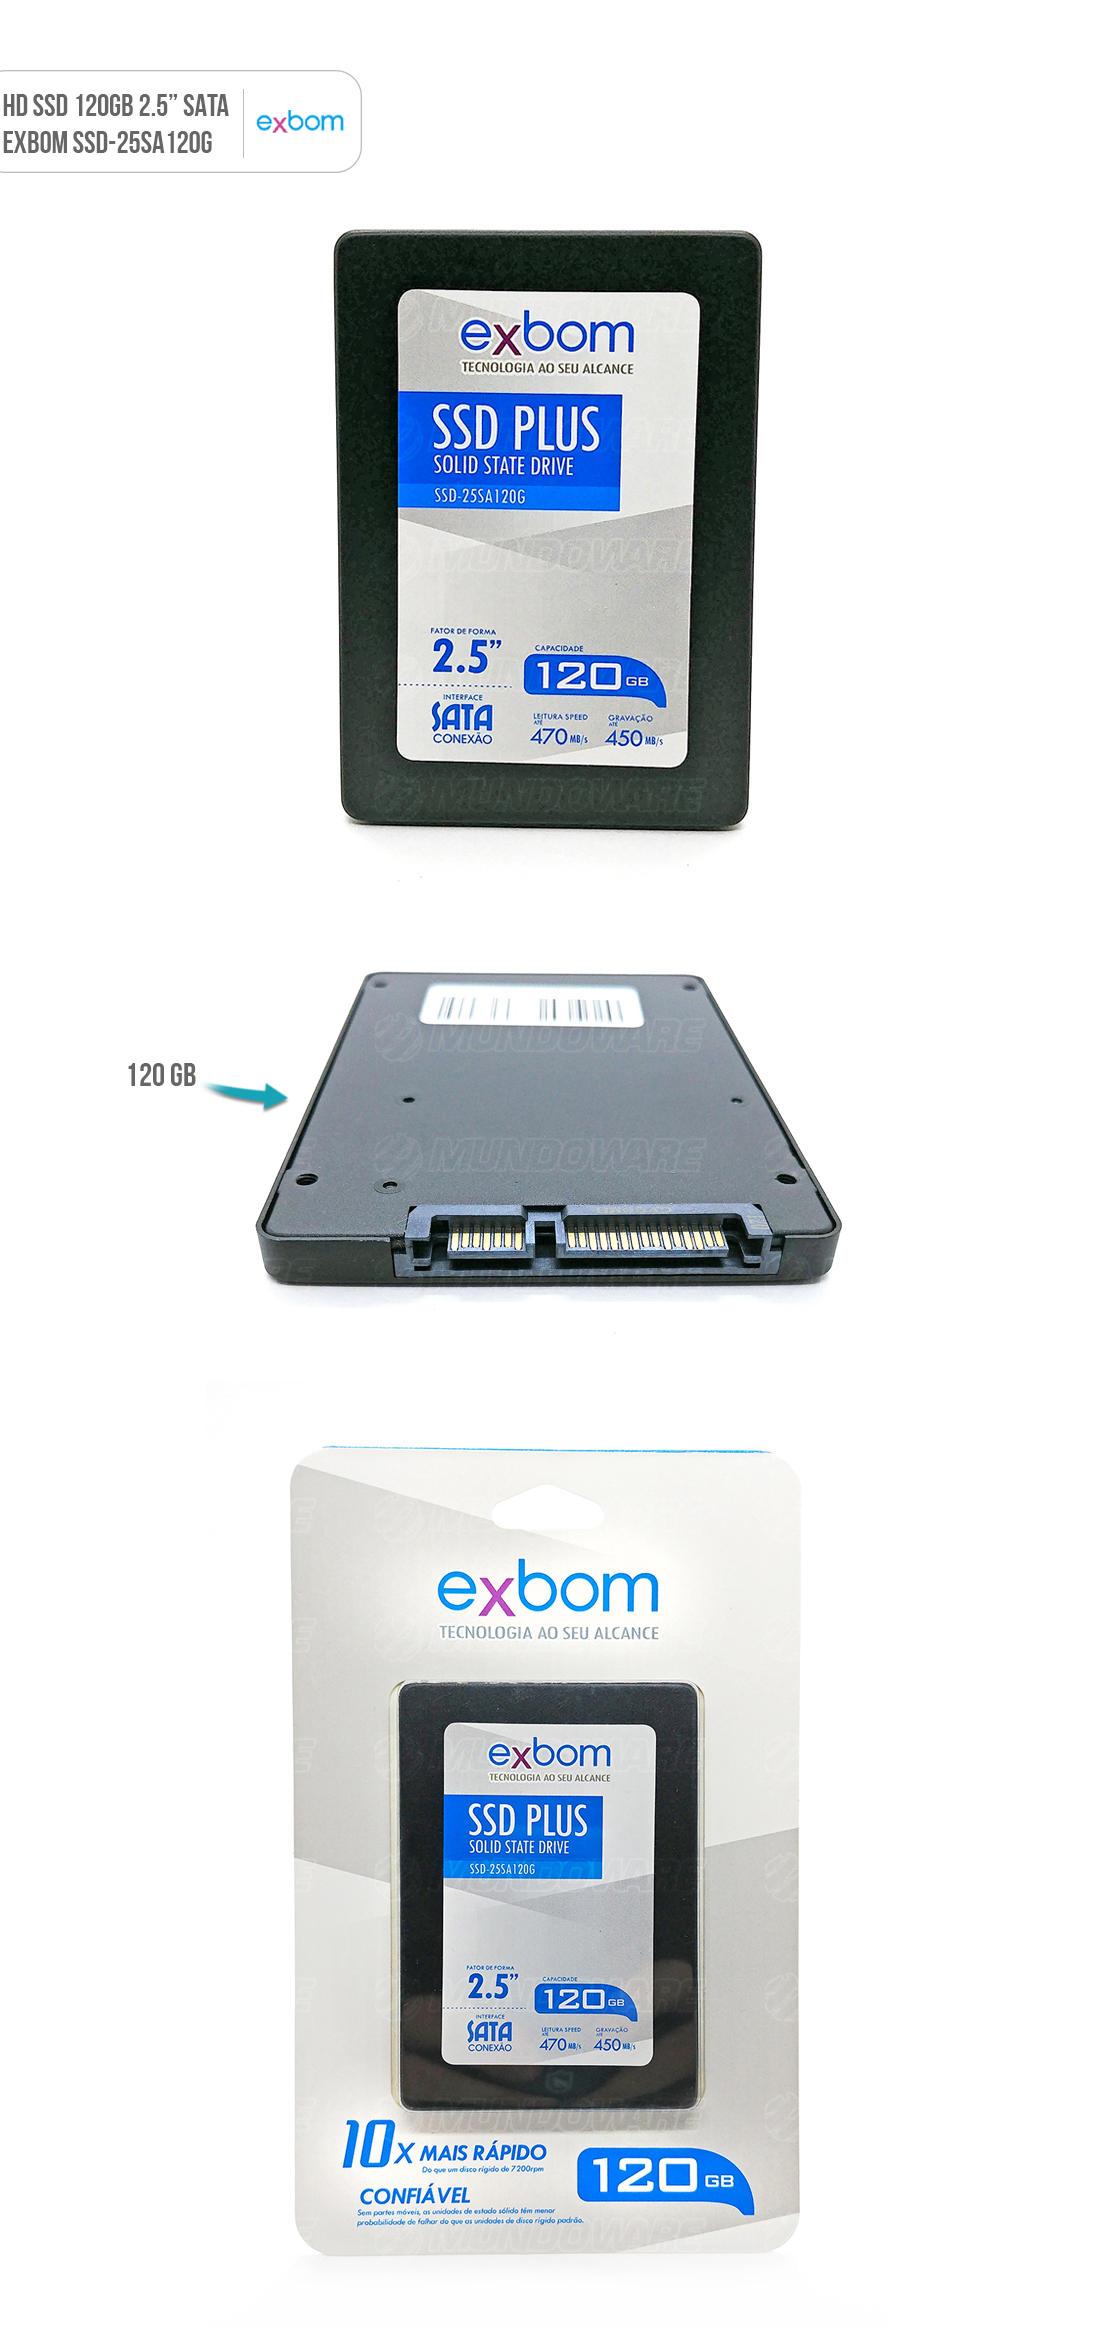 SSD 120 GB 10x mais rápido que HD Normal Solid State Drive da Exbom